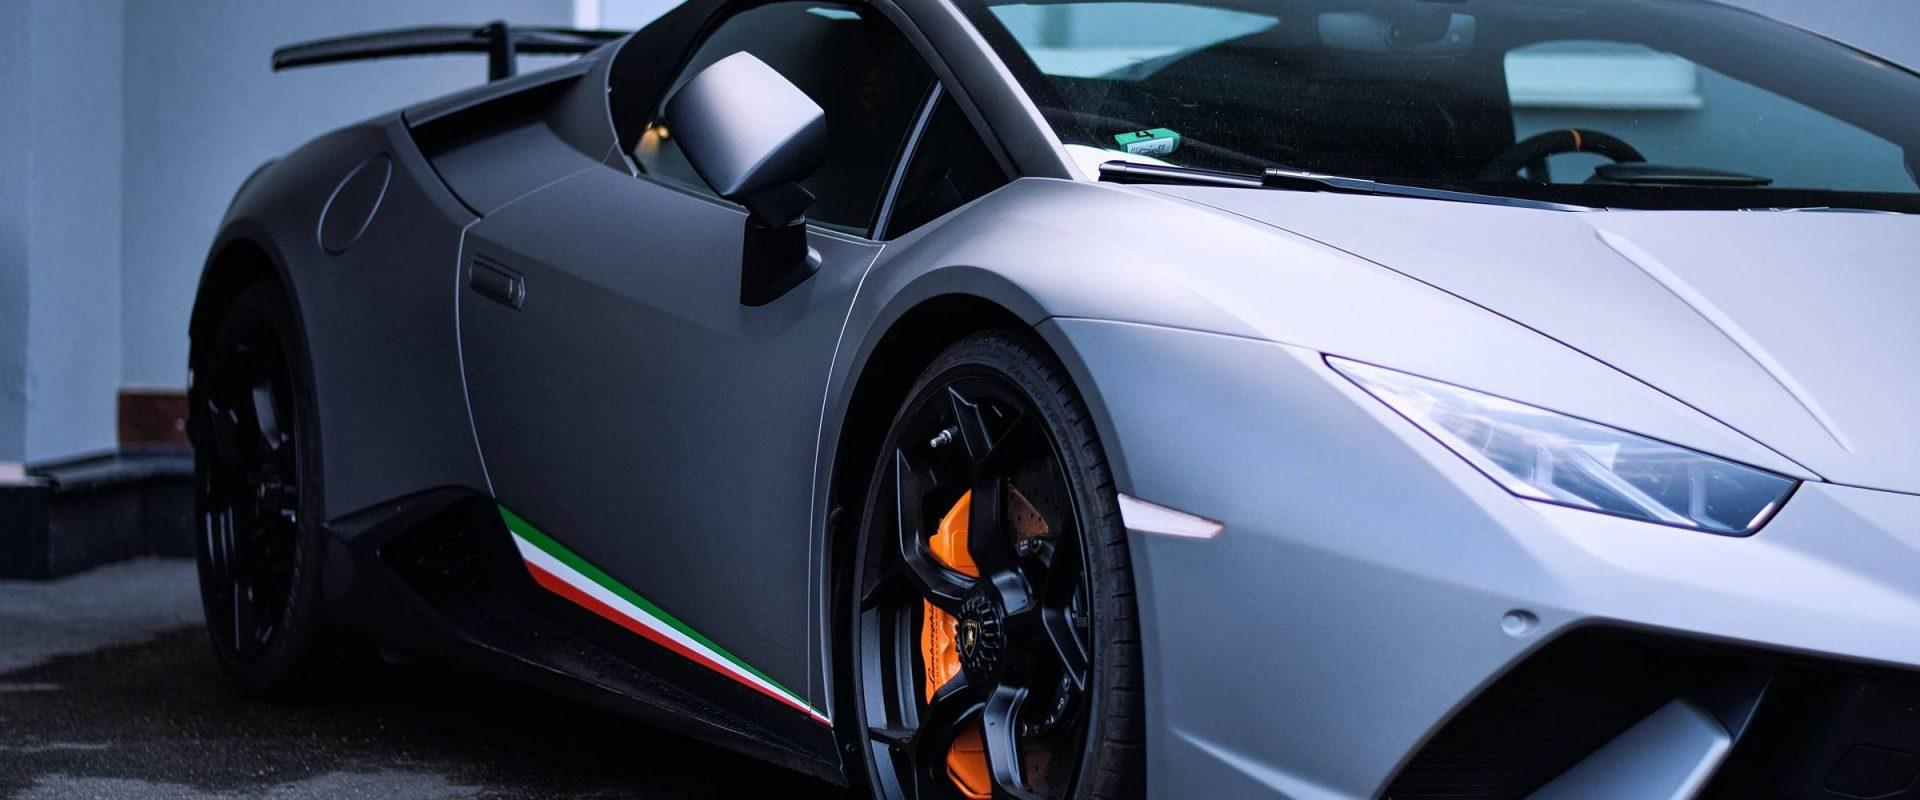 Conheça os 7 carros de luxo mais caros de todos os tempos!